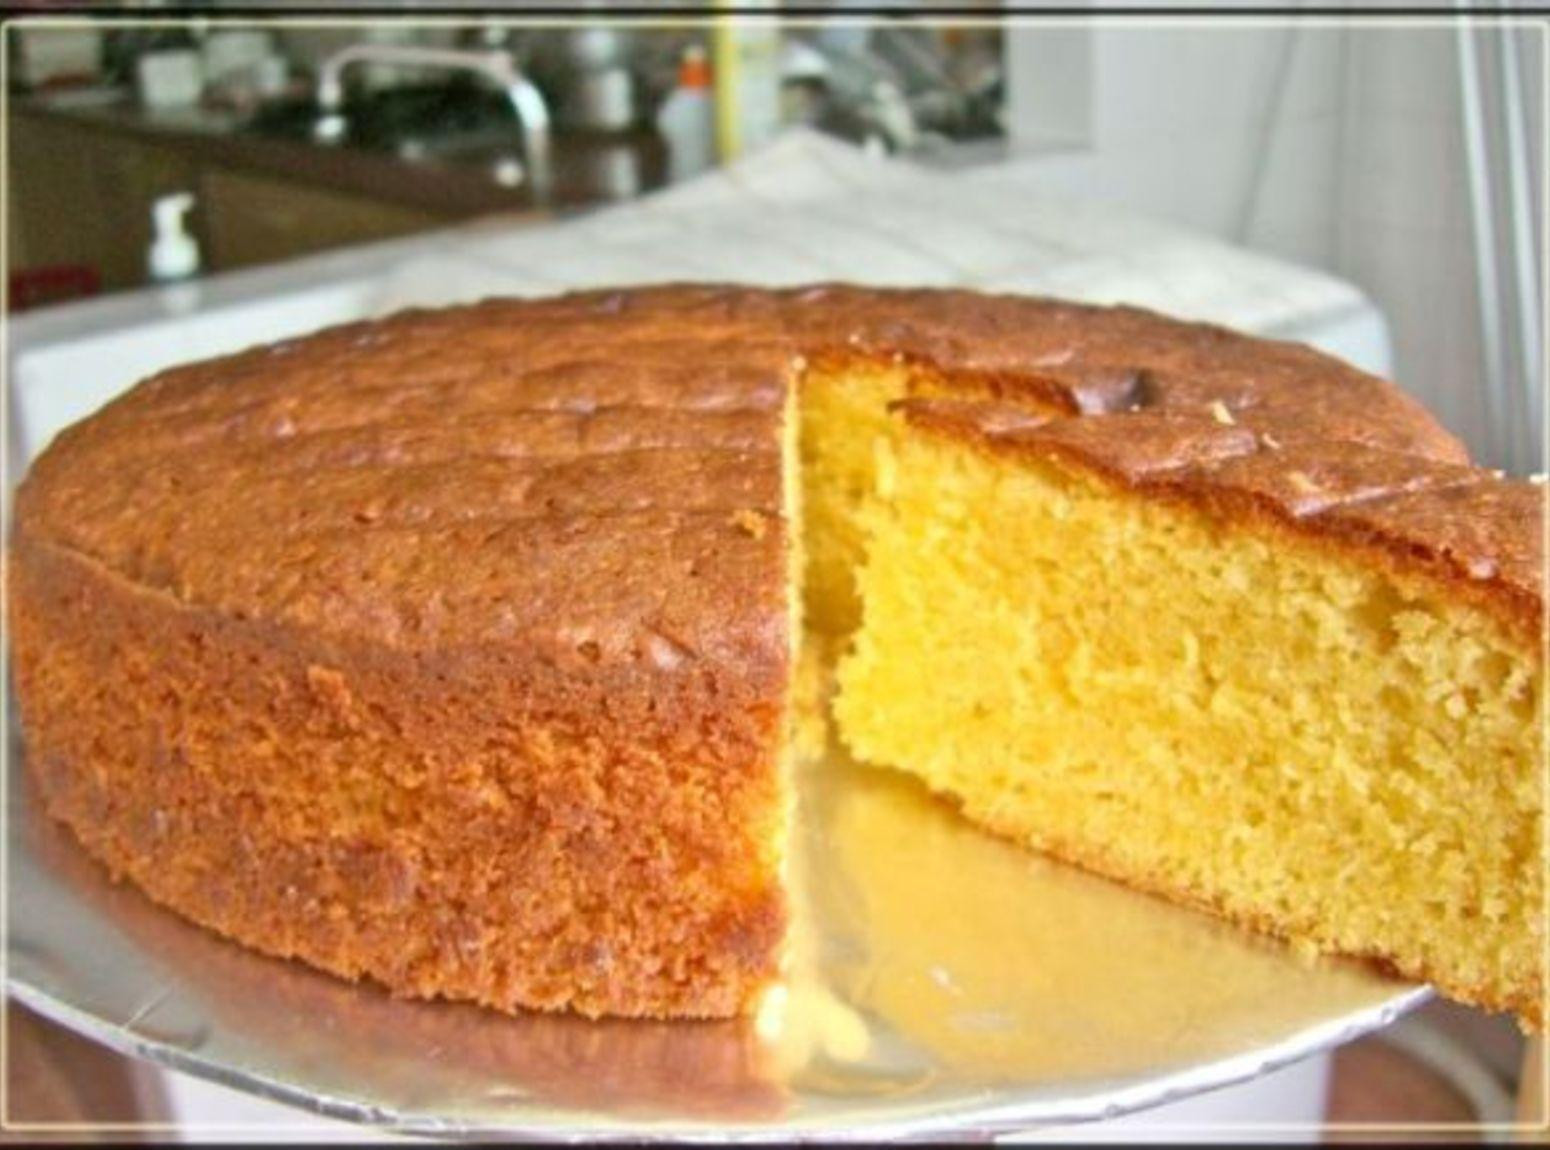 Sponge Cake Recipe  Cake Boss Sponge Cake Recipe